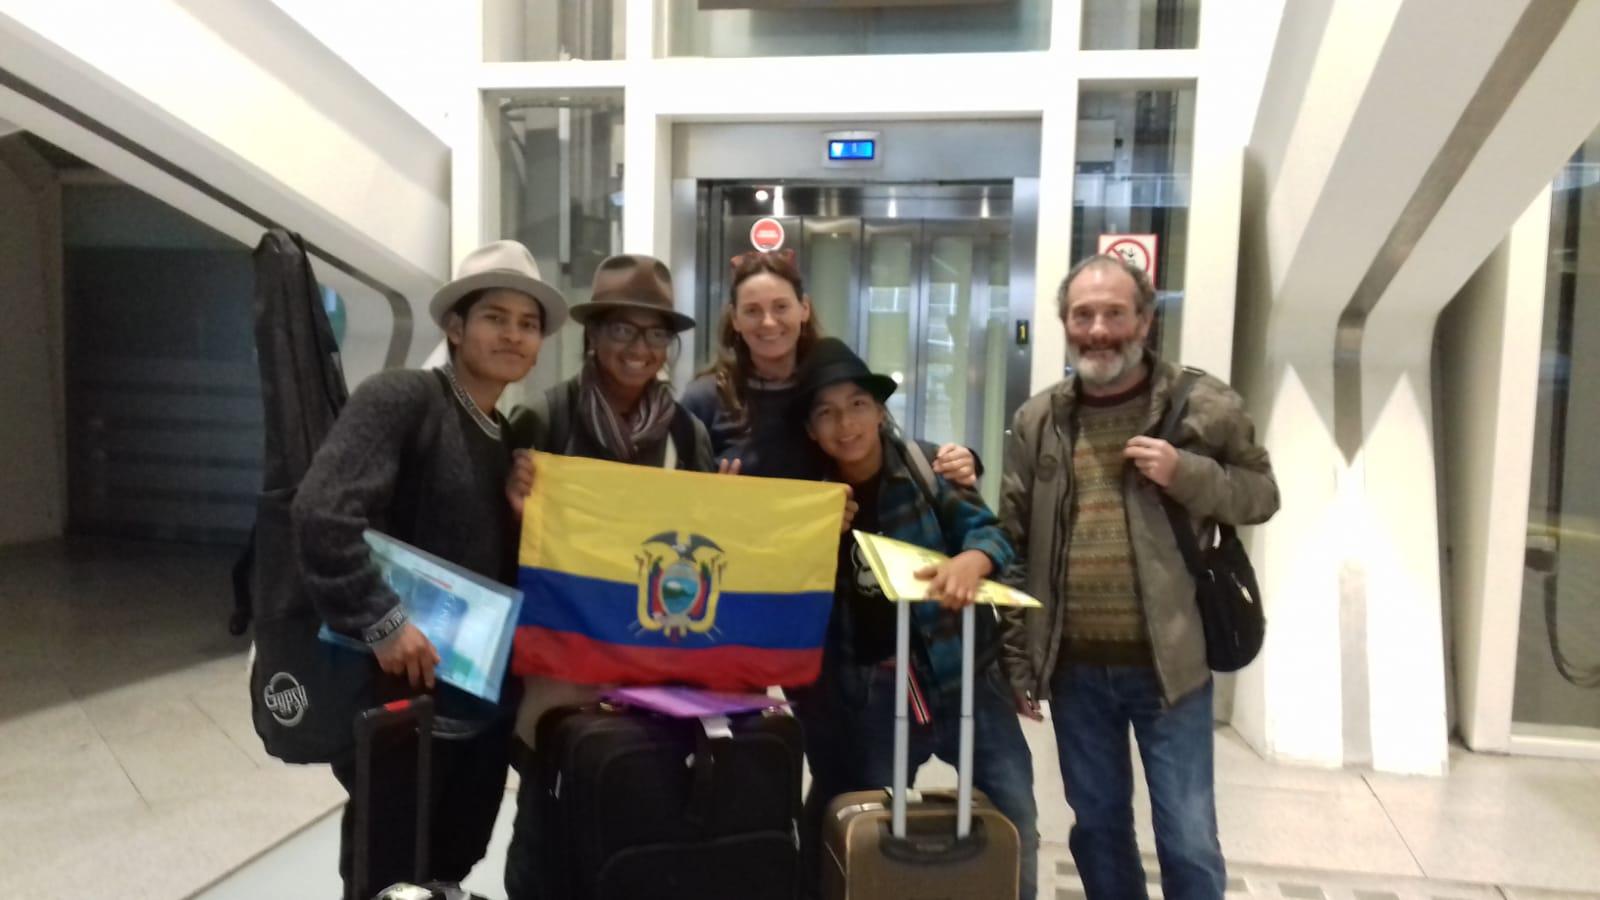 fotnot euskadi visita ecuador camino seguro llegada ayuda infancia